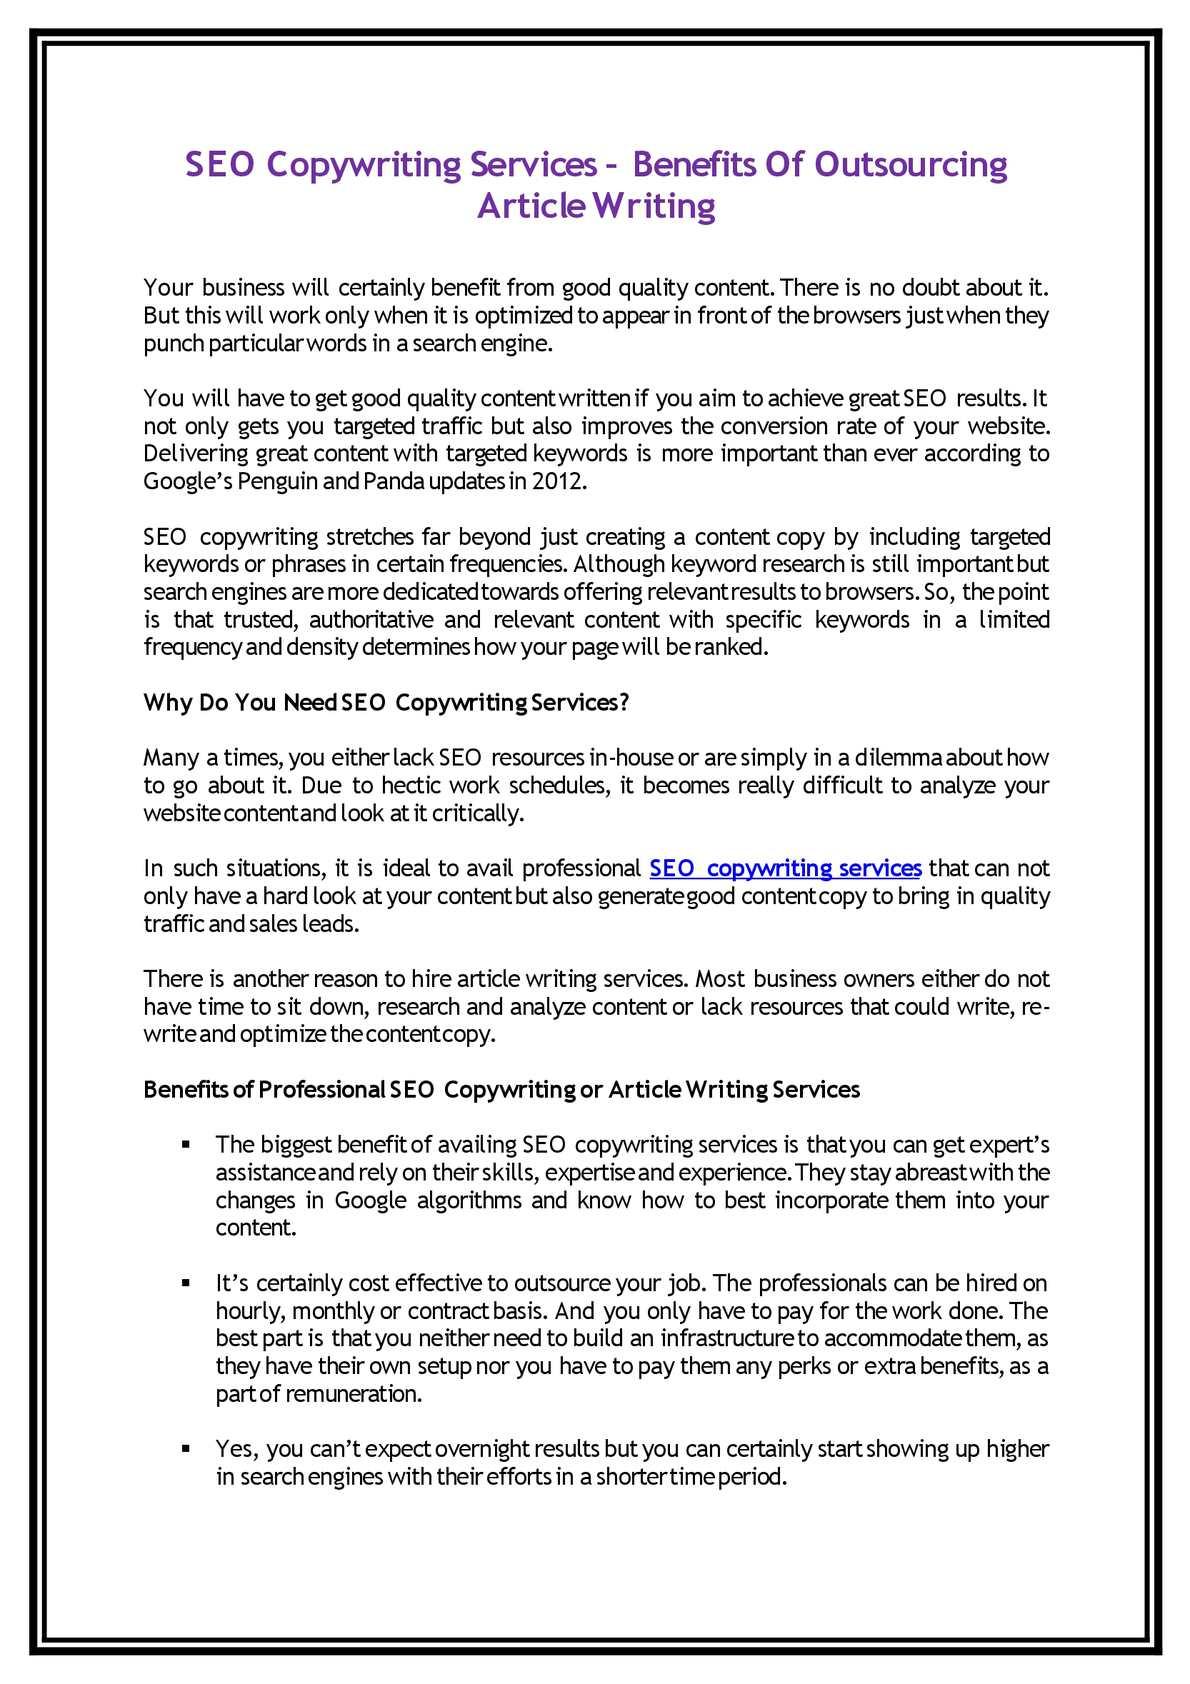 Calamo  Seo Copywriting Services  Benefits Of Outsourcing Article  Calamo  Seo Copywriting Services  Benefits Of Outsourcing Article Writing